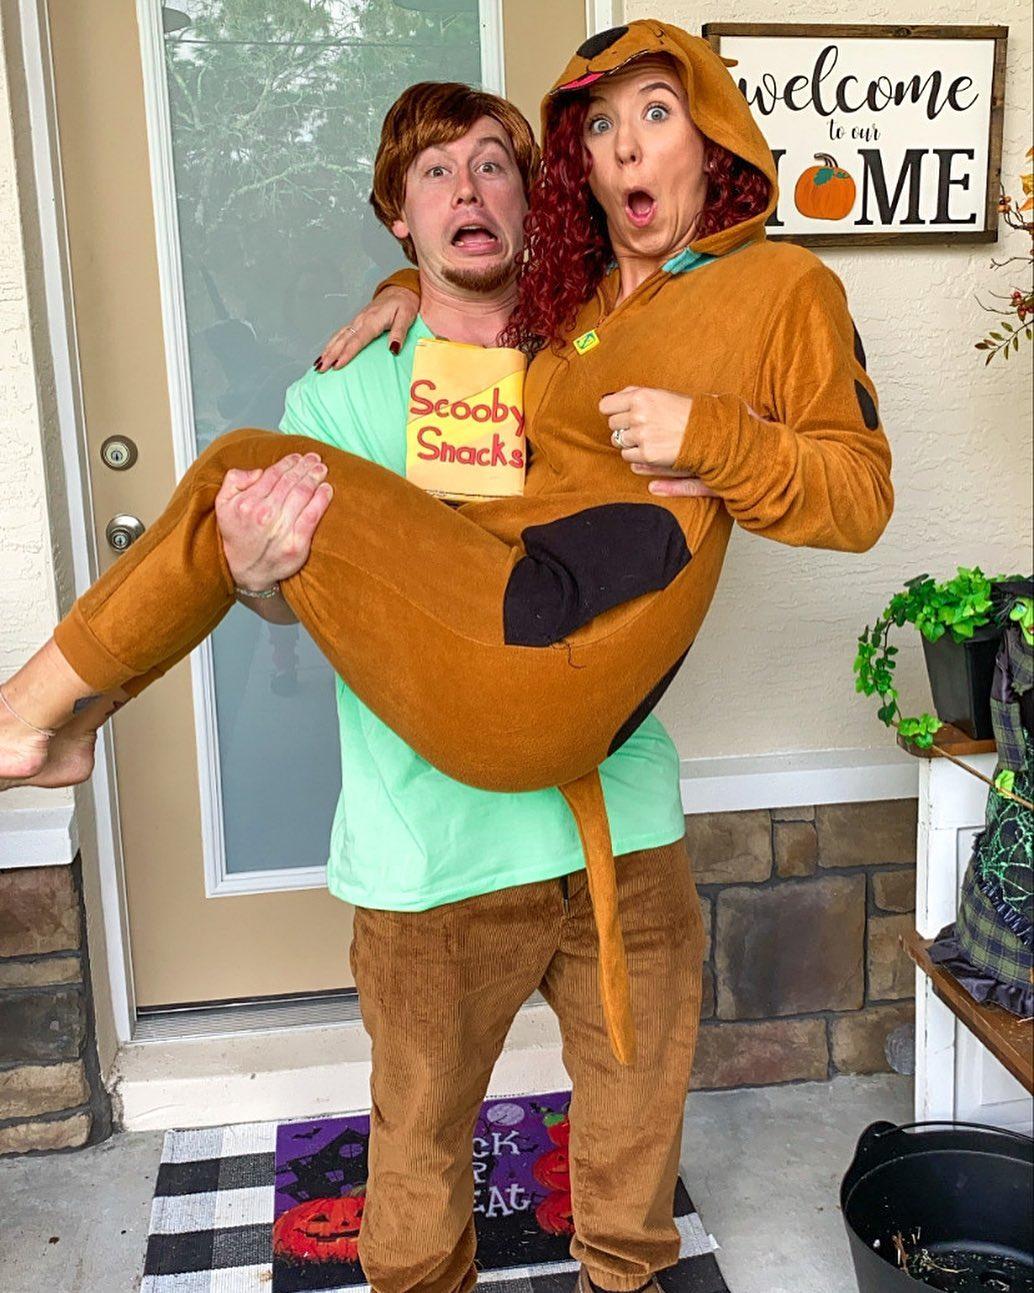 Scooby doo and shaggy funny halloween costume ideas